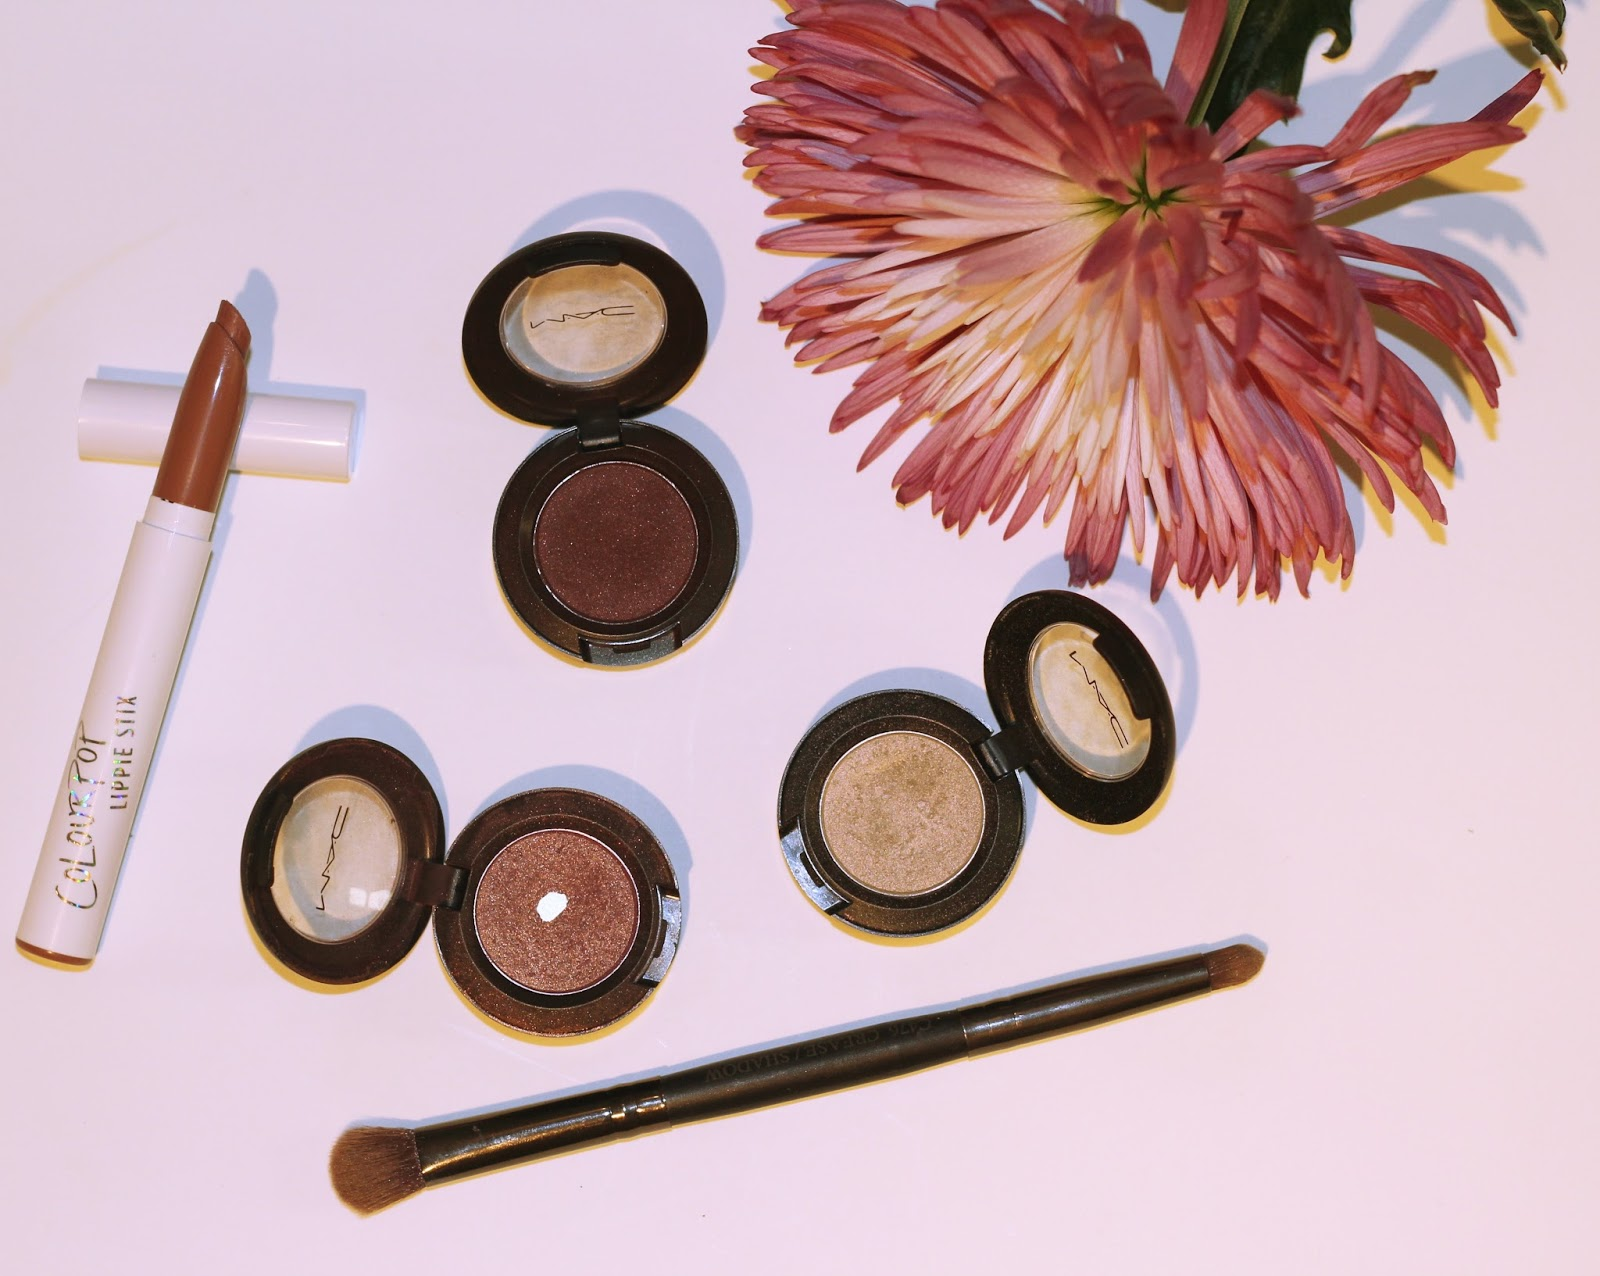 MAC eyeshadow and ColourPop Lipstick